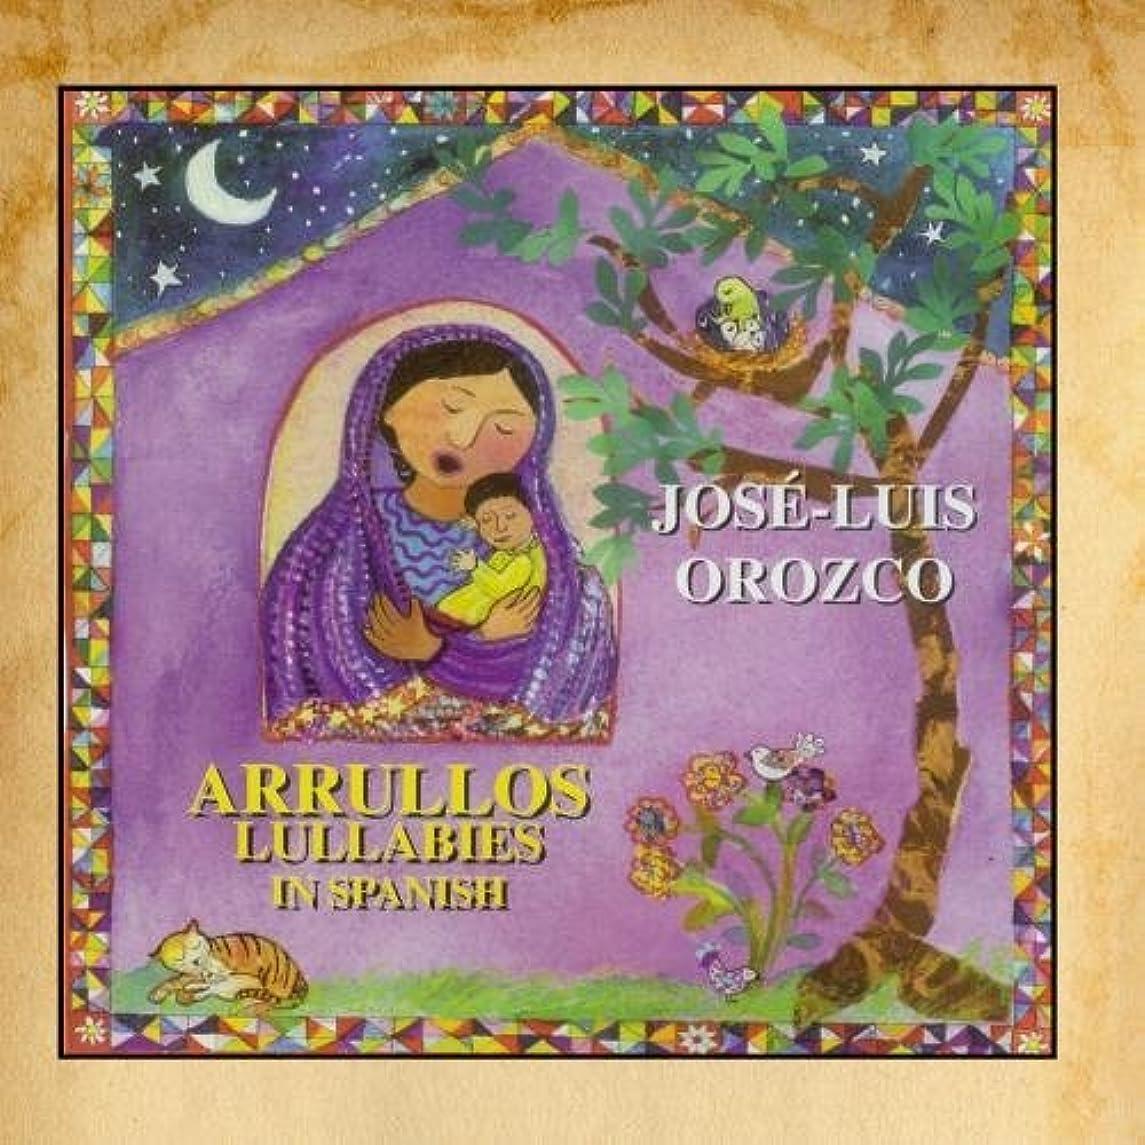 Arrullos/ Lullabies In Spanish by Jos??-Luis Orozco